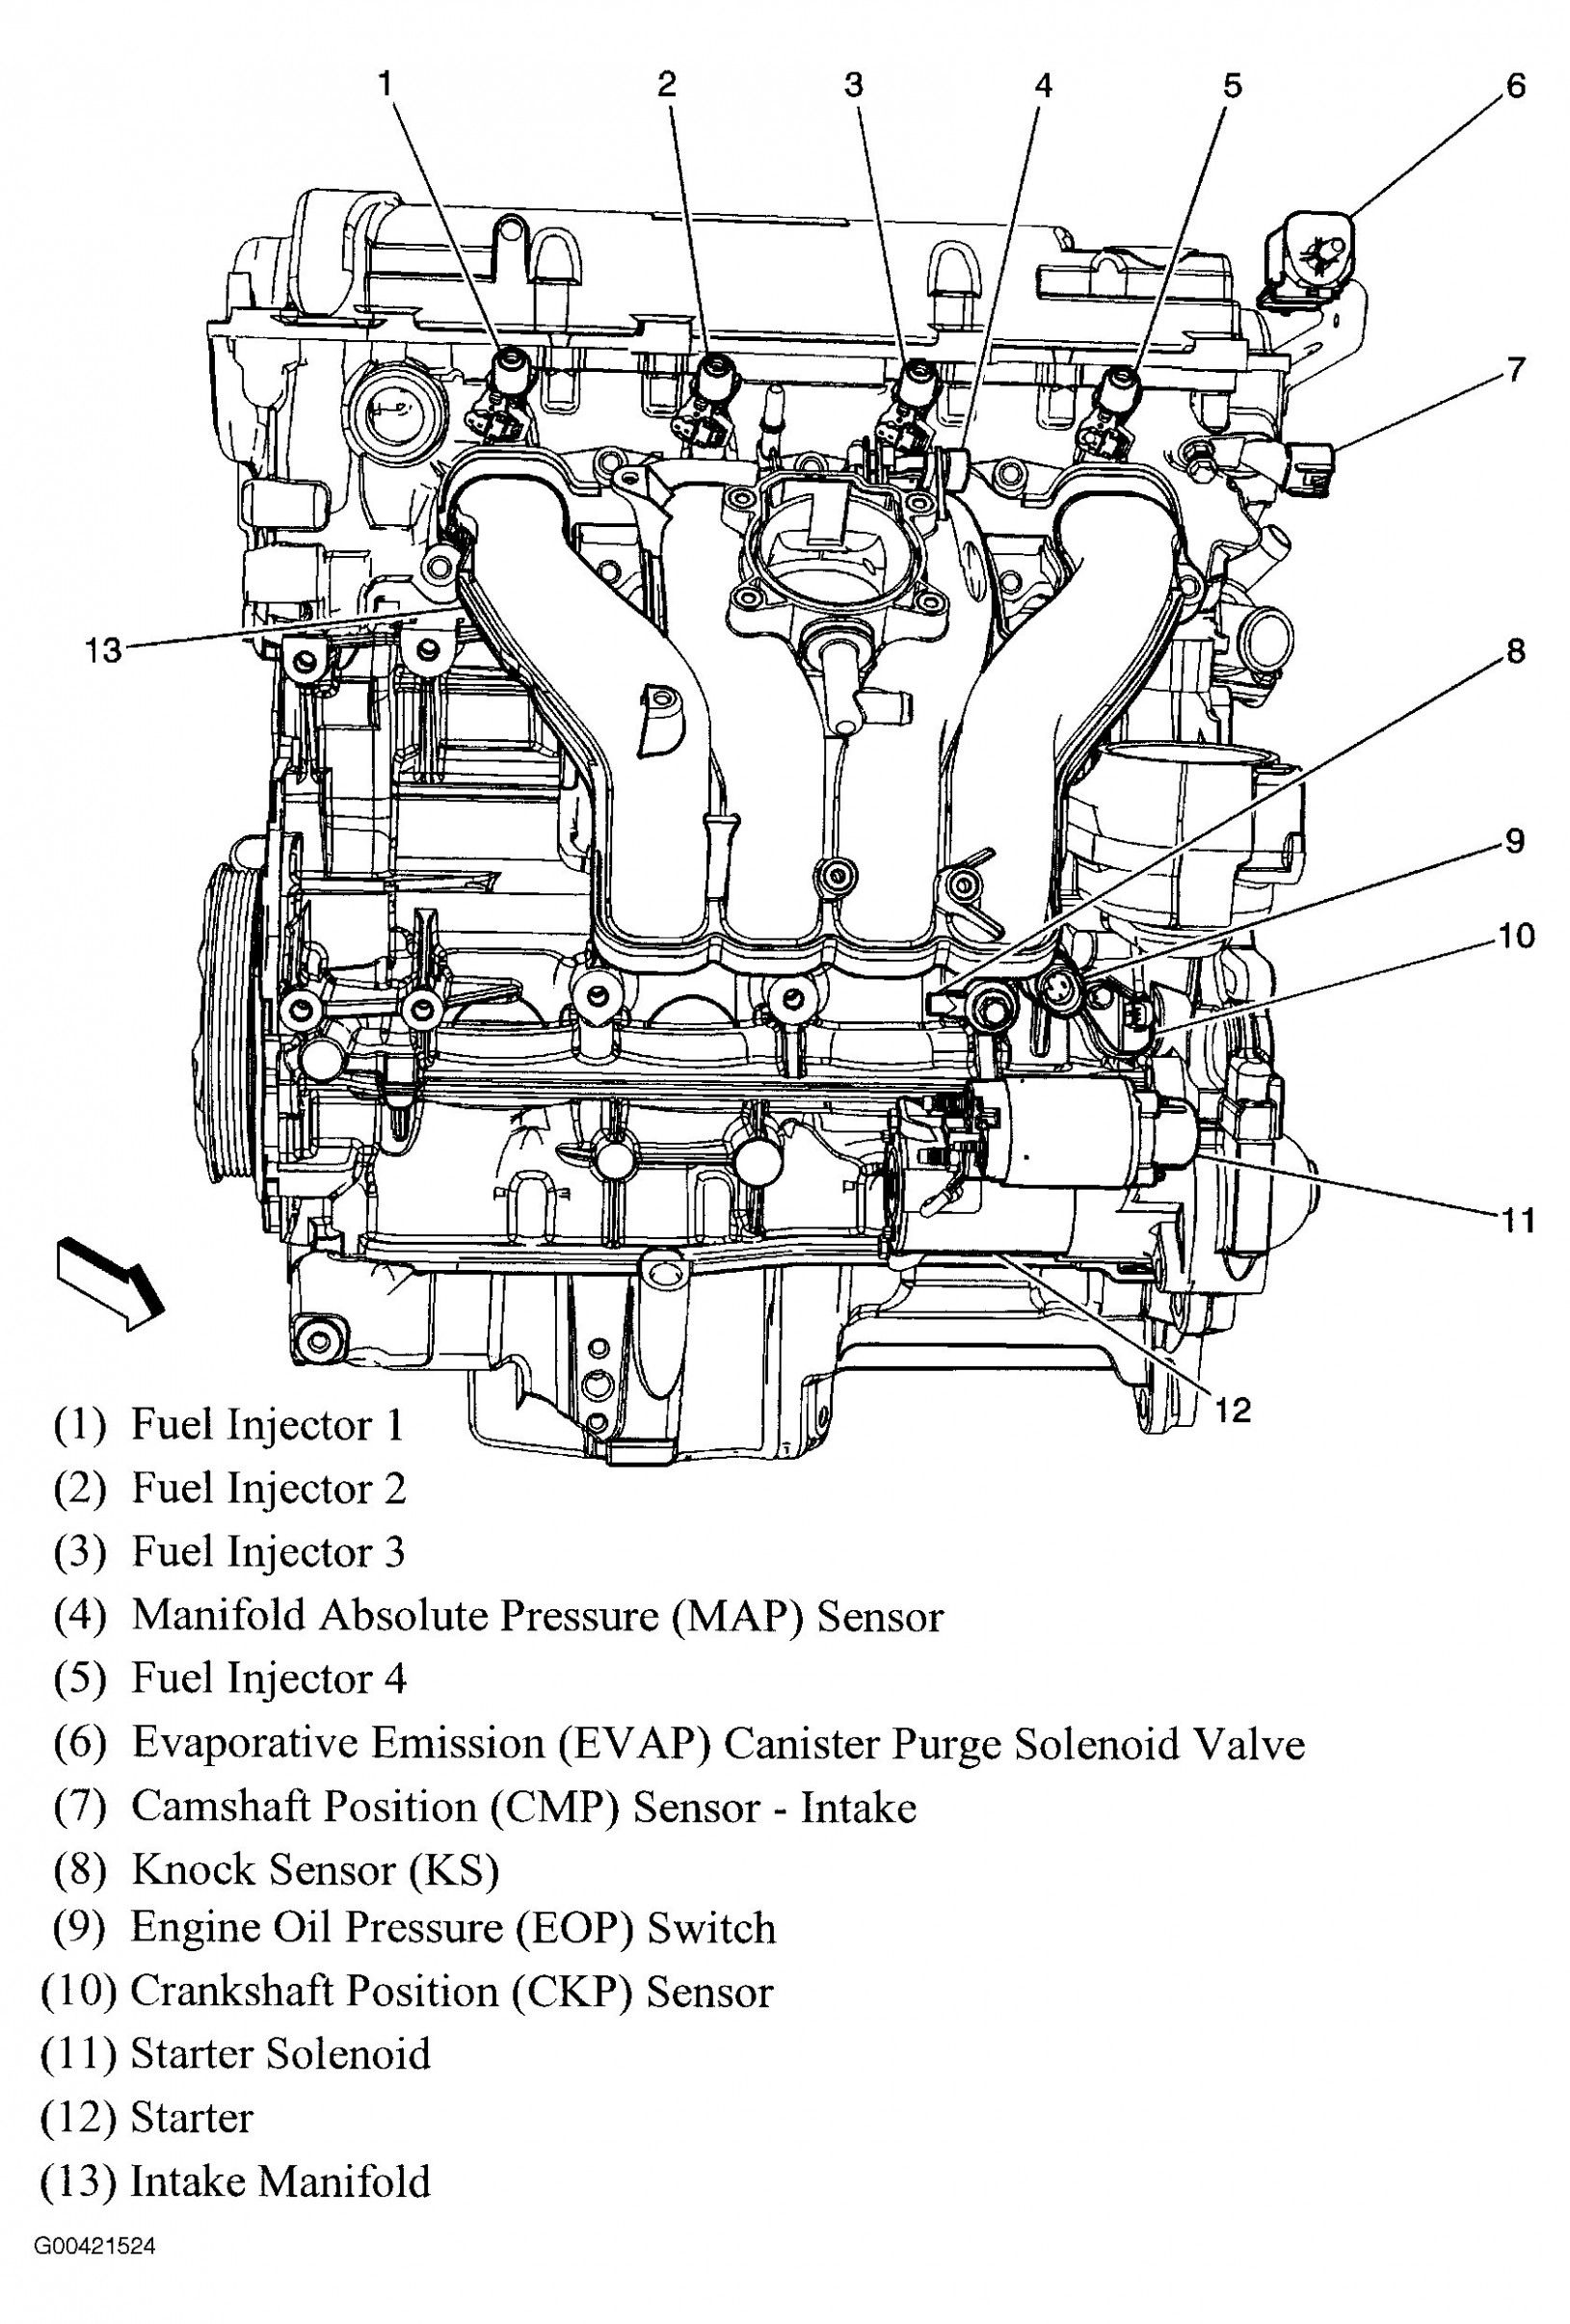 Inline 8 Cylinder Engine Diagram di 2020